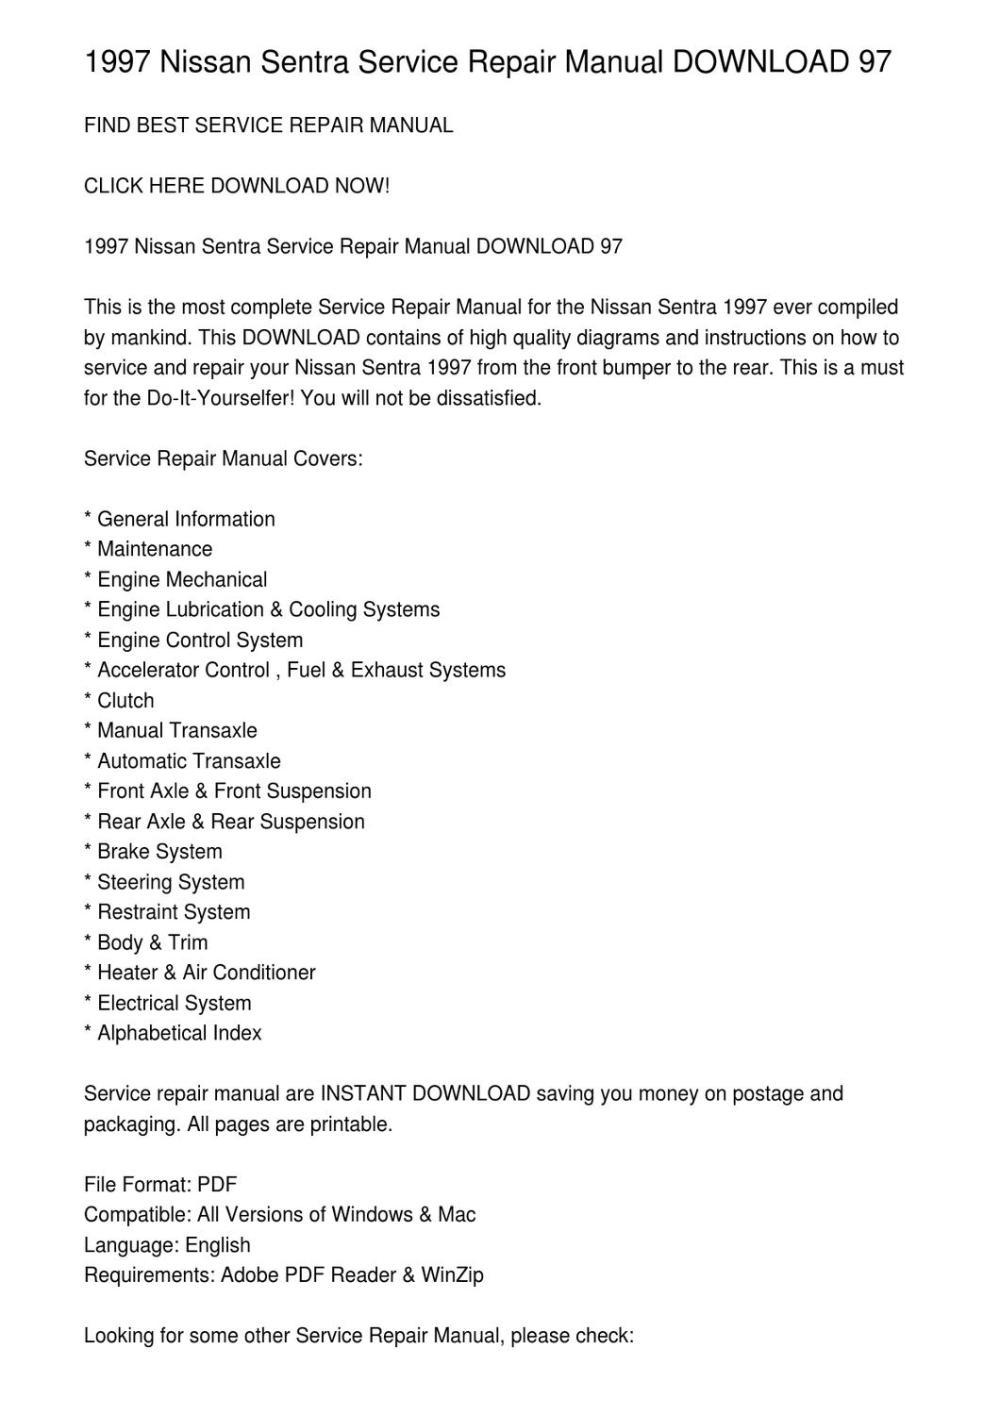 medium resolution of 1997 nissan sentra service repair manual download 97 by vadim birch issuu